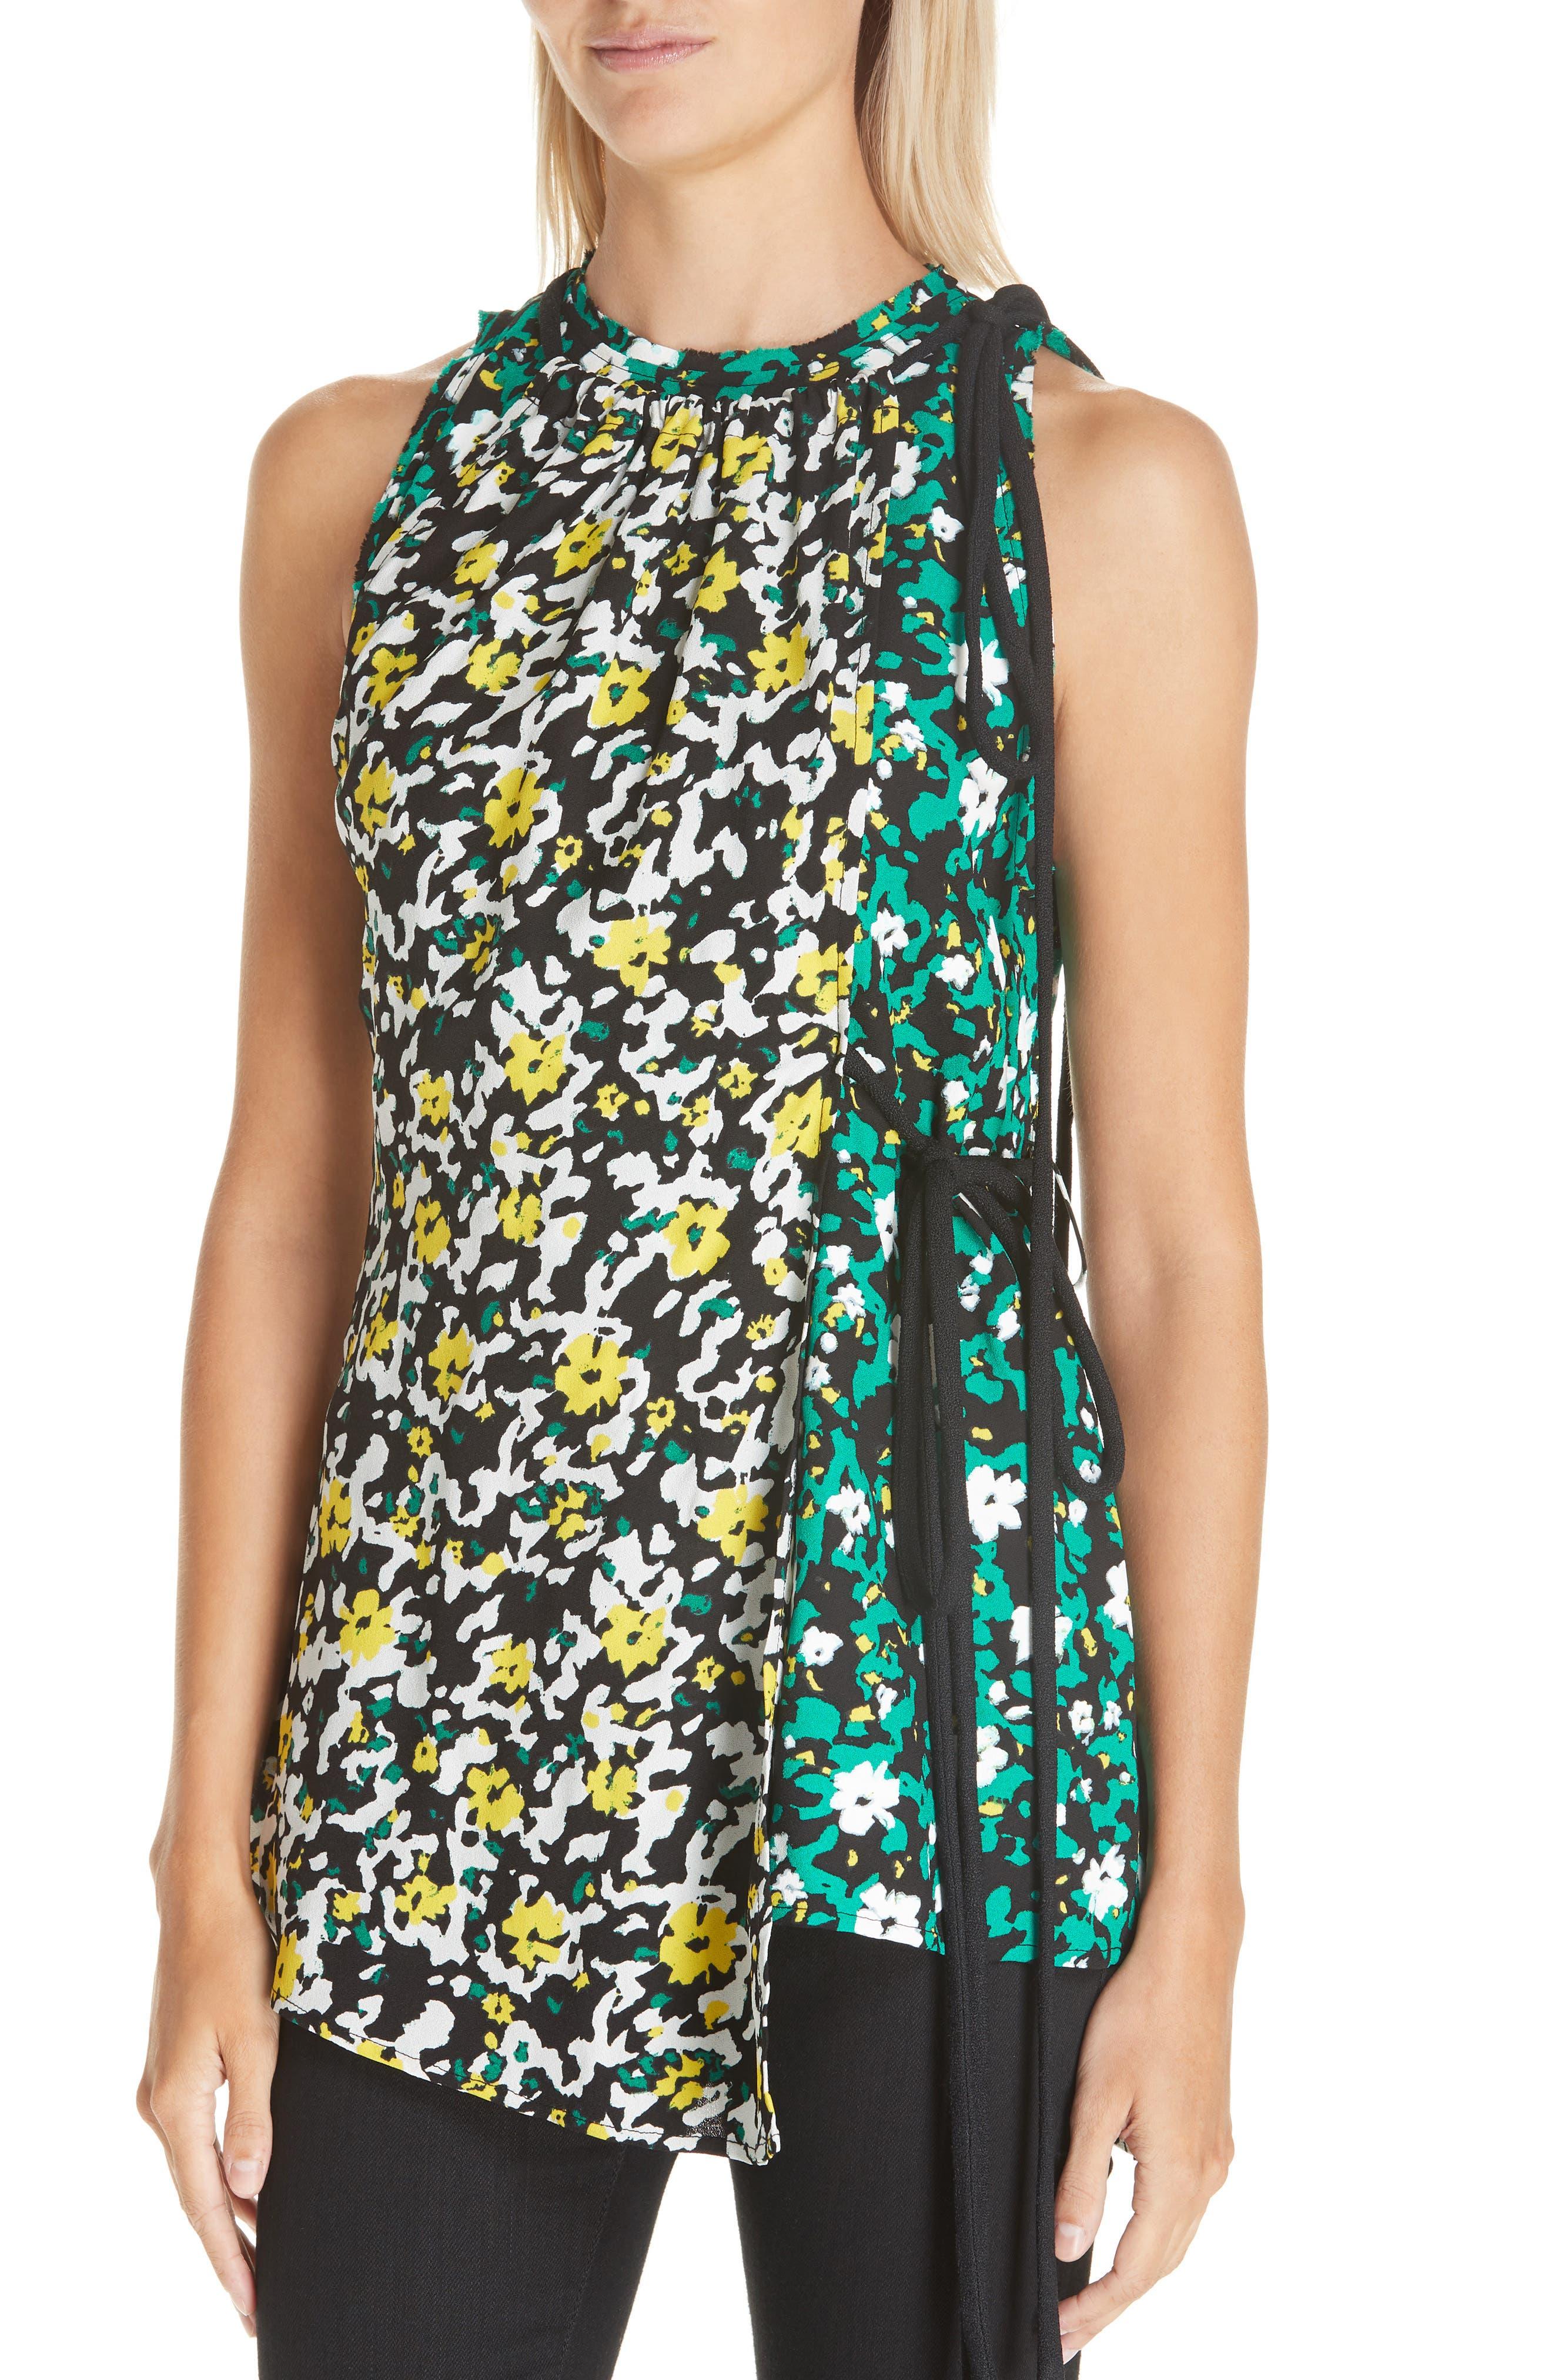 PROENZA SCHOULER, Side Tie Floral Print Blouse, Alternate thumbnail 4, color, WHITE WILDFLOWER